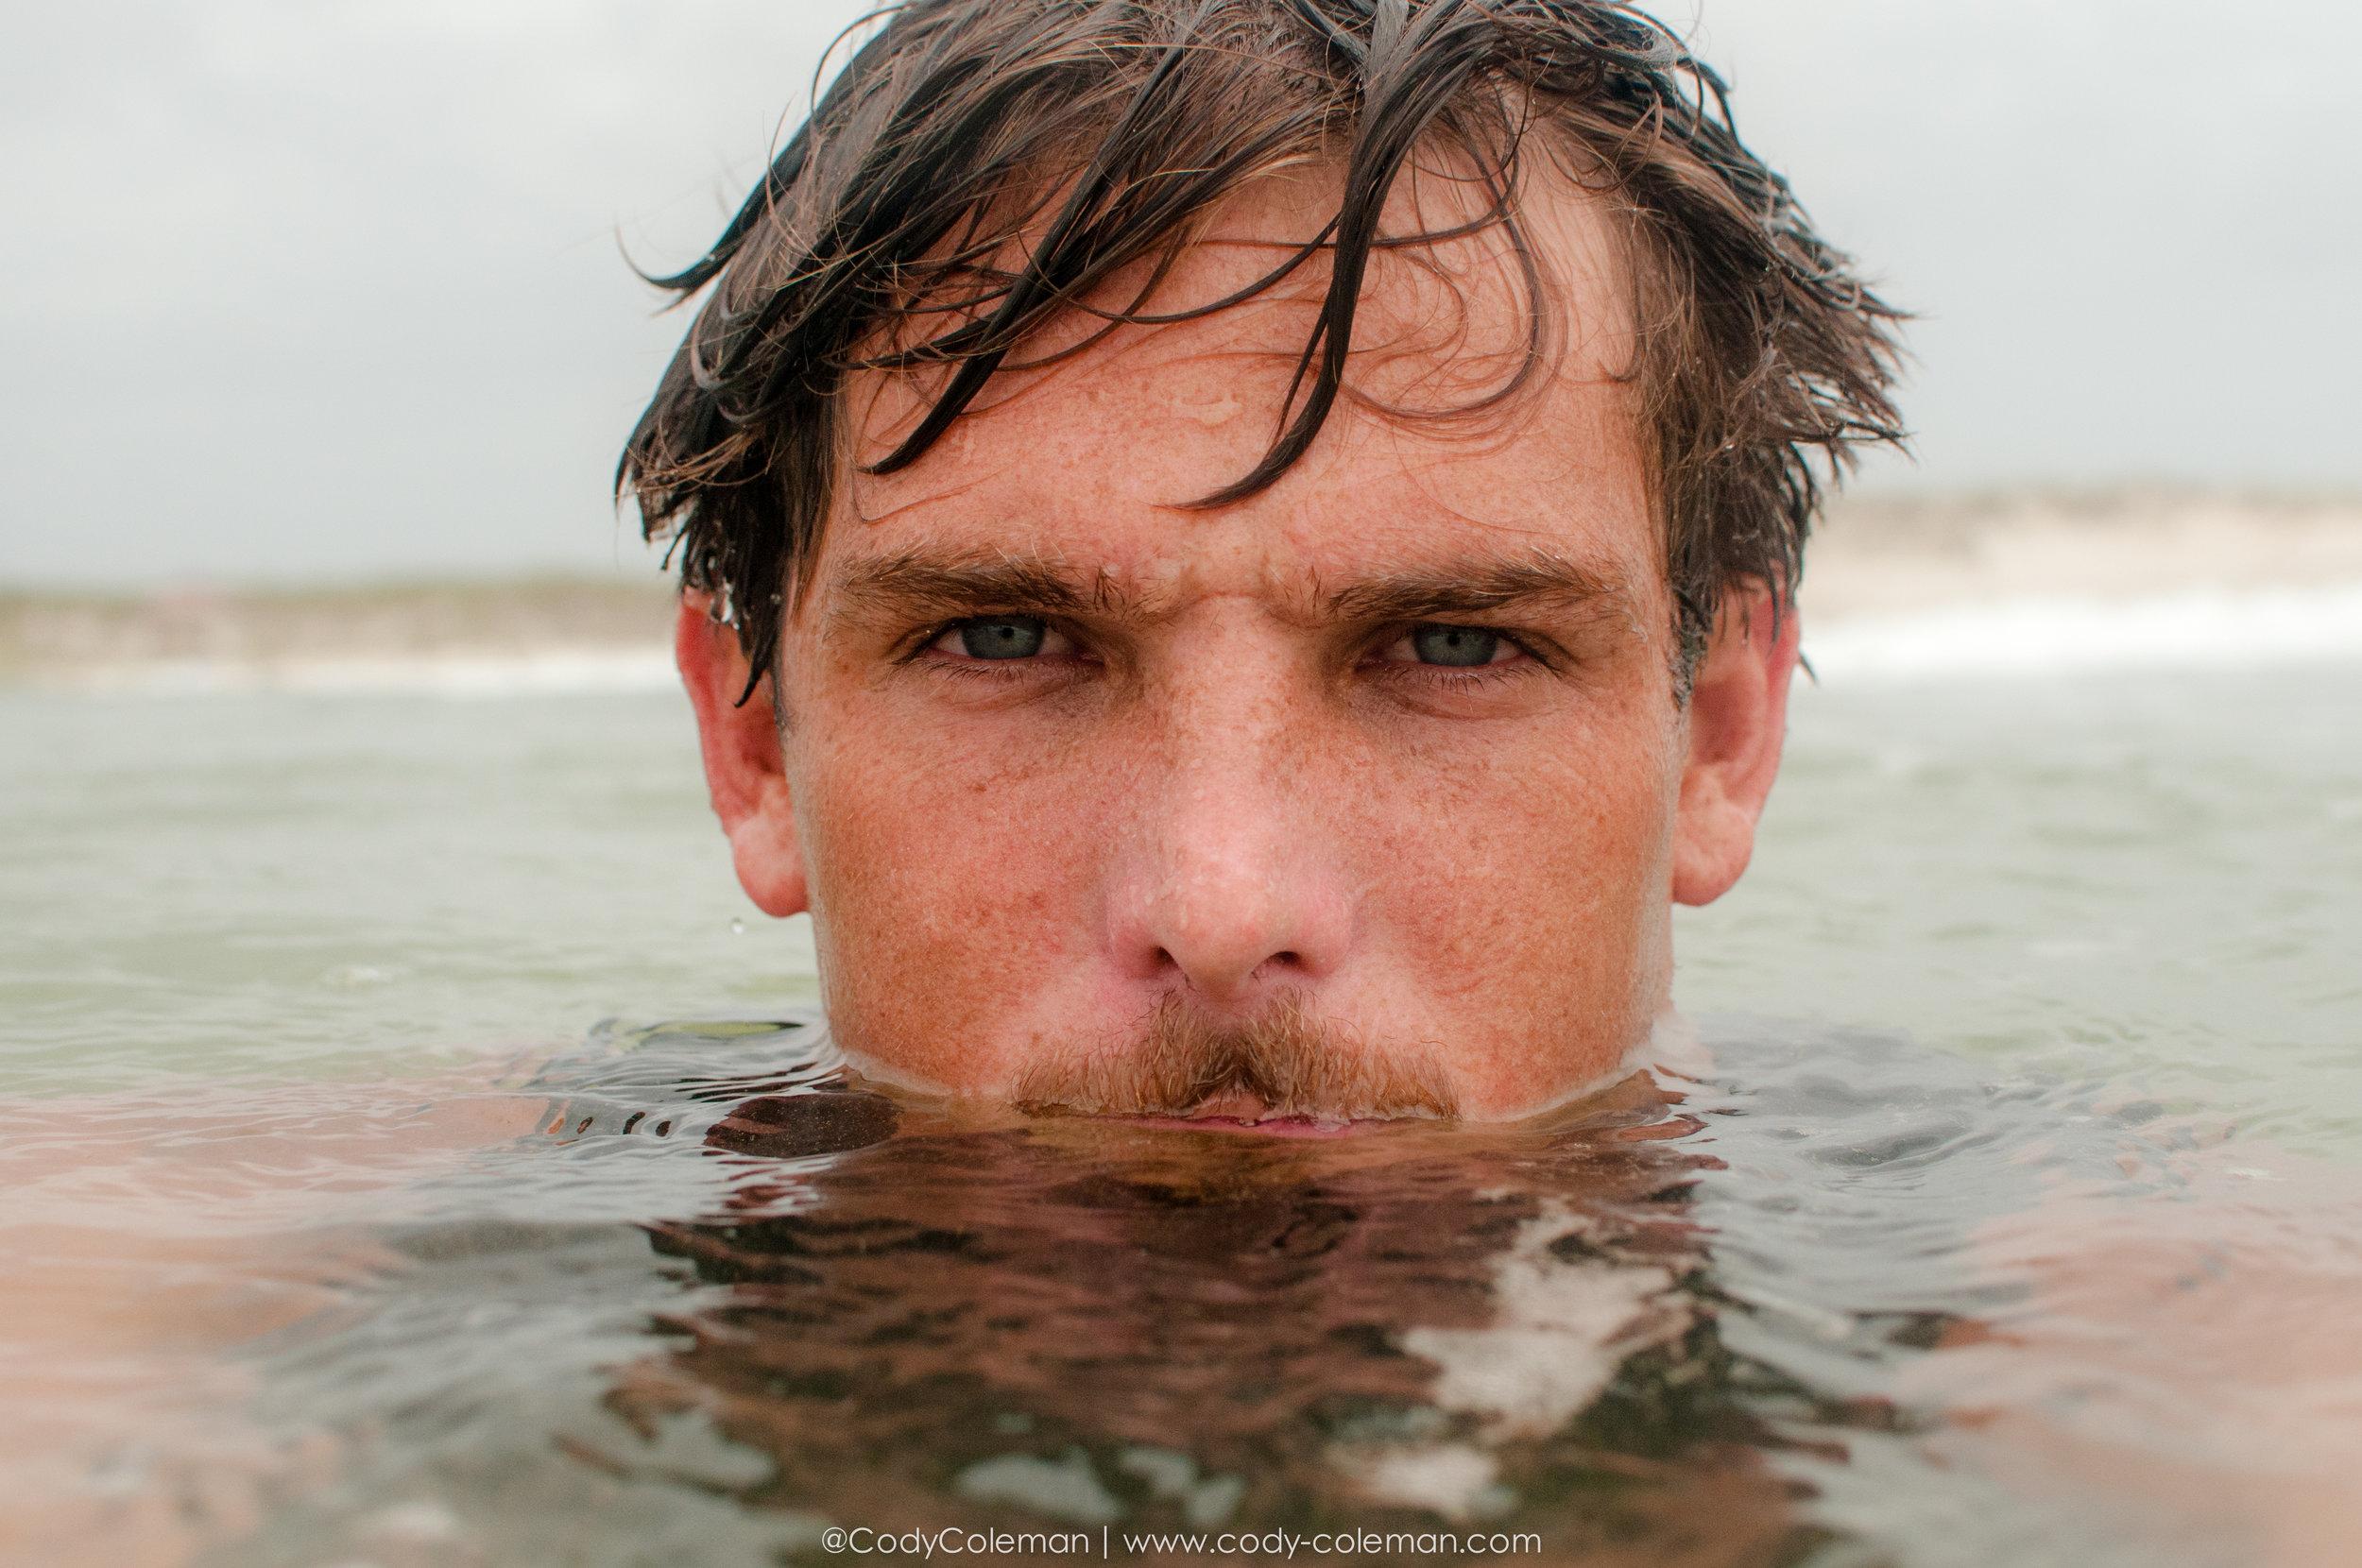 Just your average salt water addict!